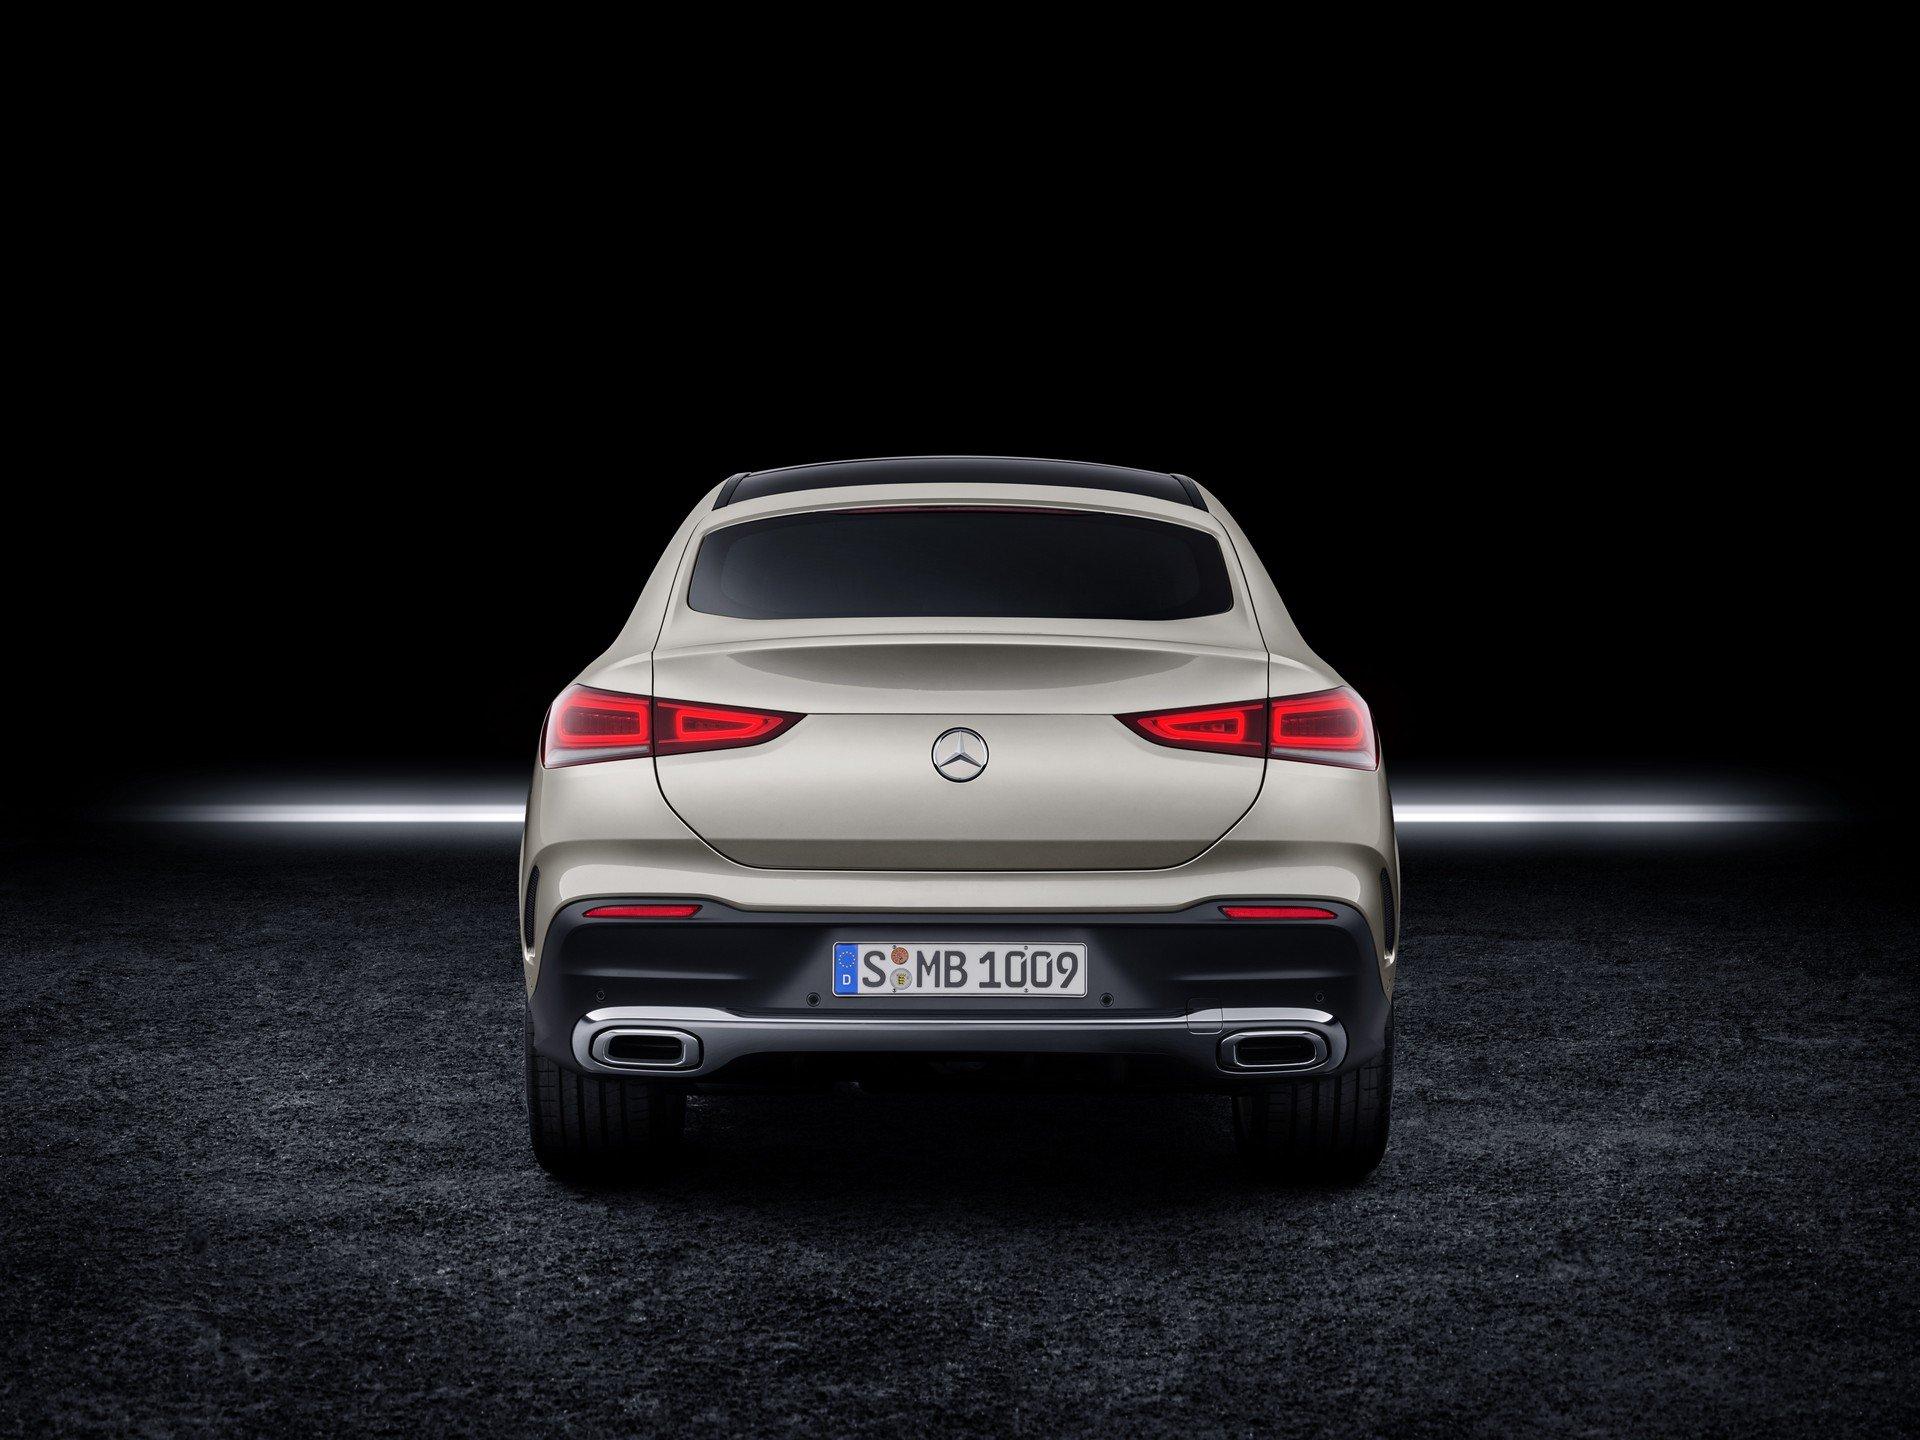 2020 Mercedes-Benz GLE Coupe ve AMG GLE 53 Coupe modelleri tanıtıldı